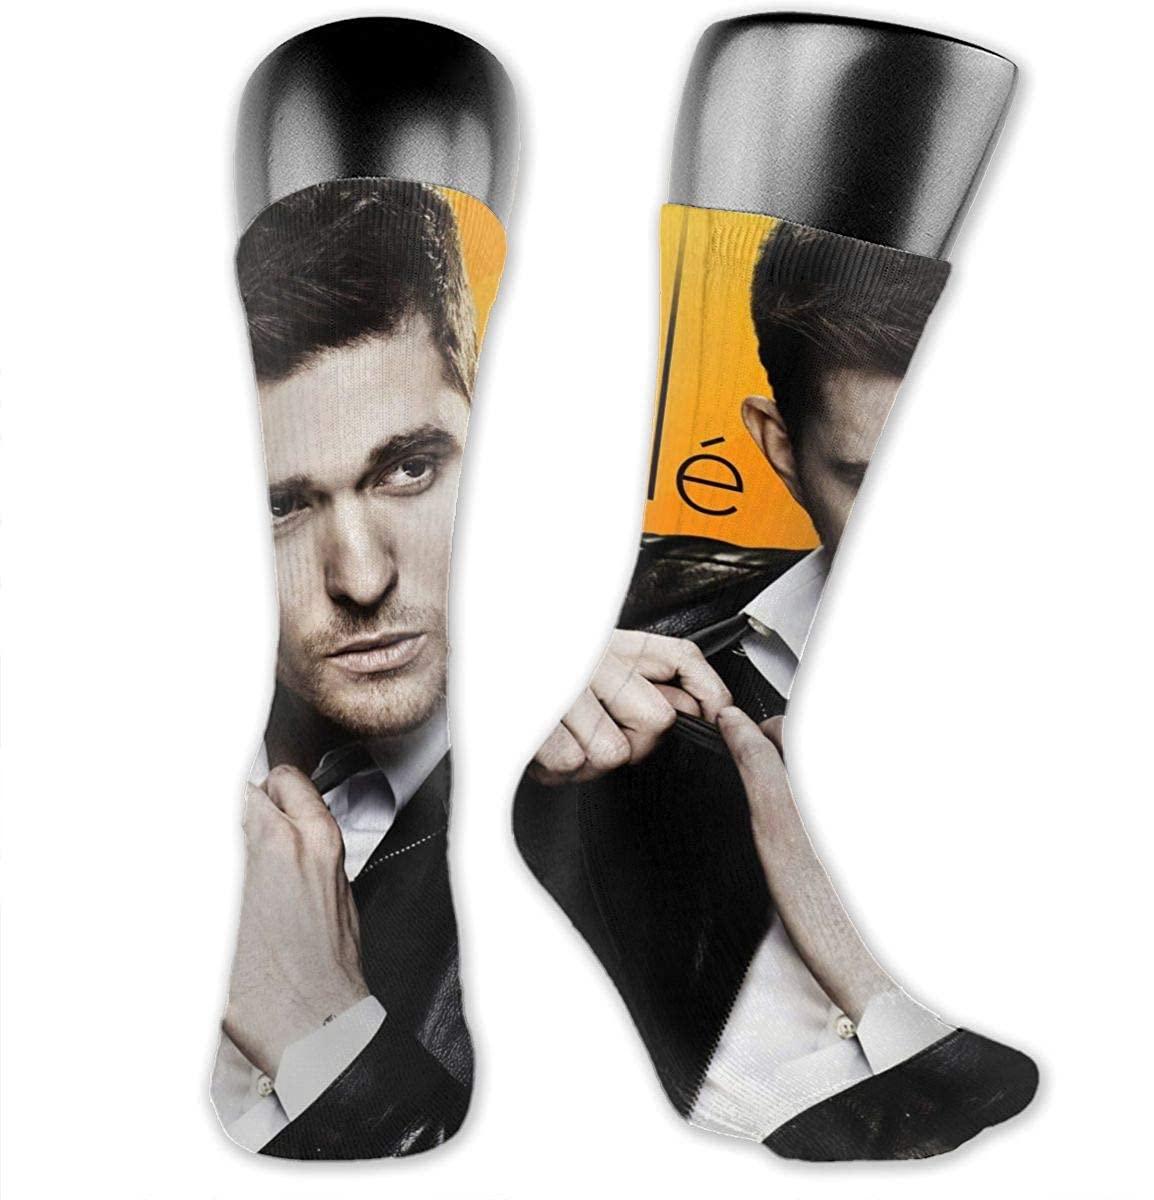 Michael Buble Medium Long Socks Dress Hose Crew Short Anklet For Workout